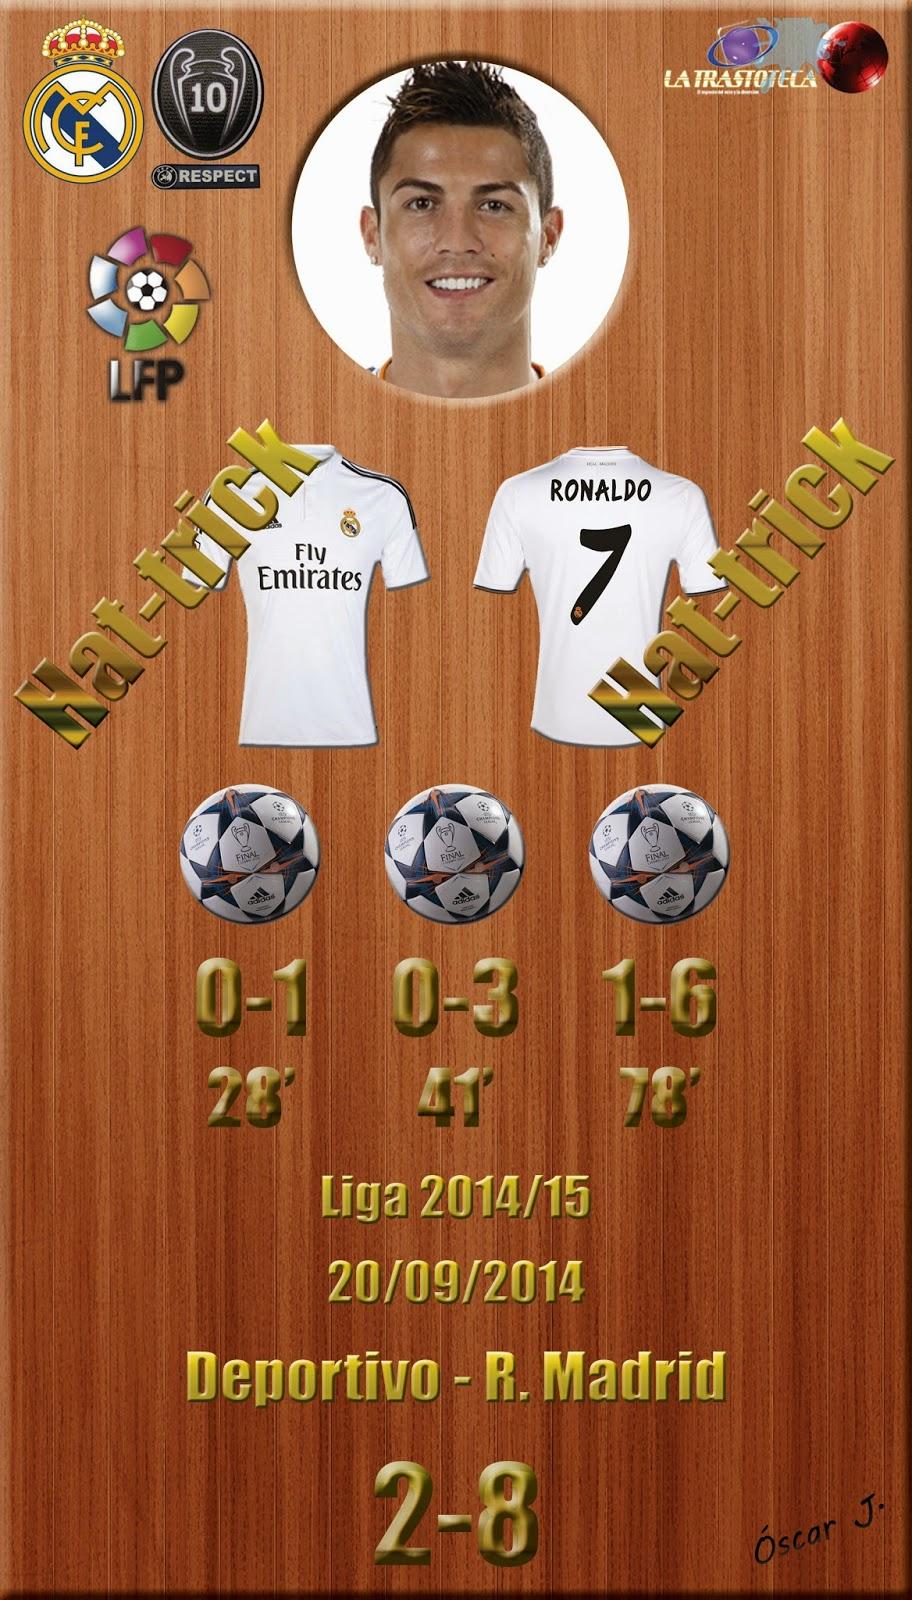 Cristiano Ronaldo (Hat-Trick) - Liga 2014/15. Jornada 4 (20/09/2014)